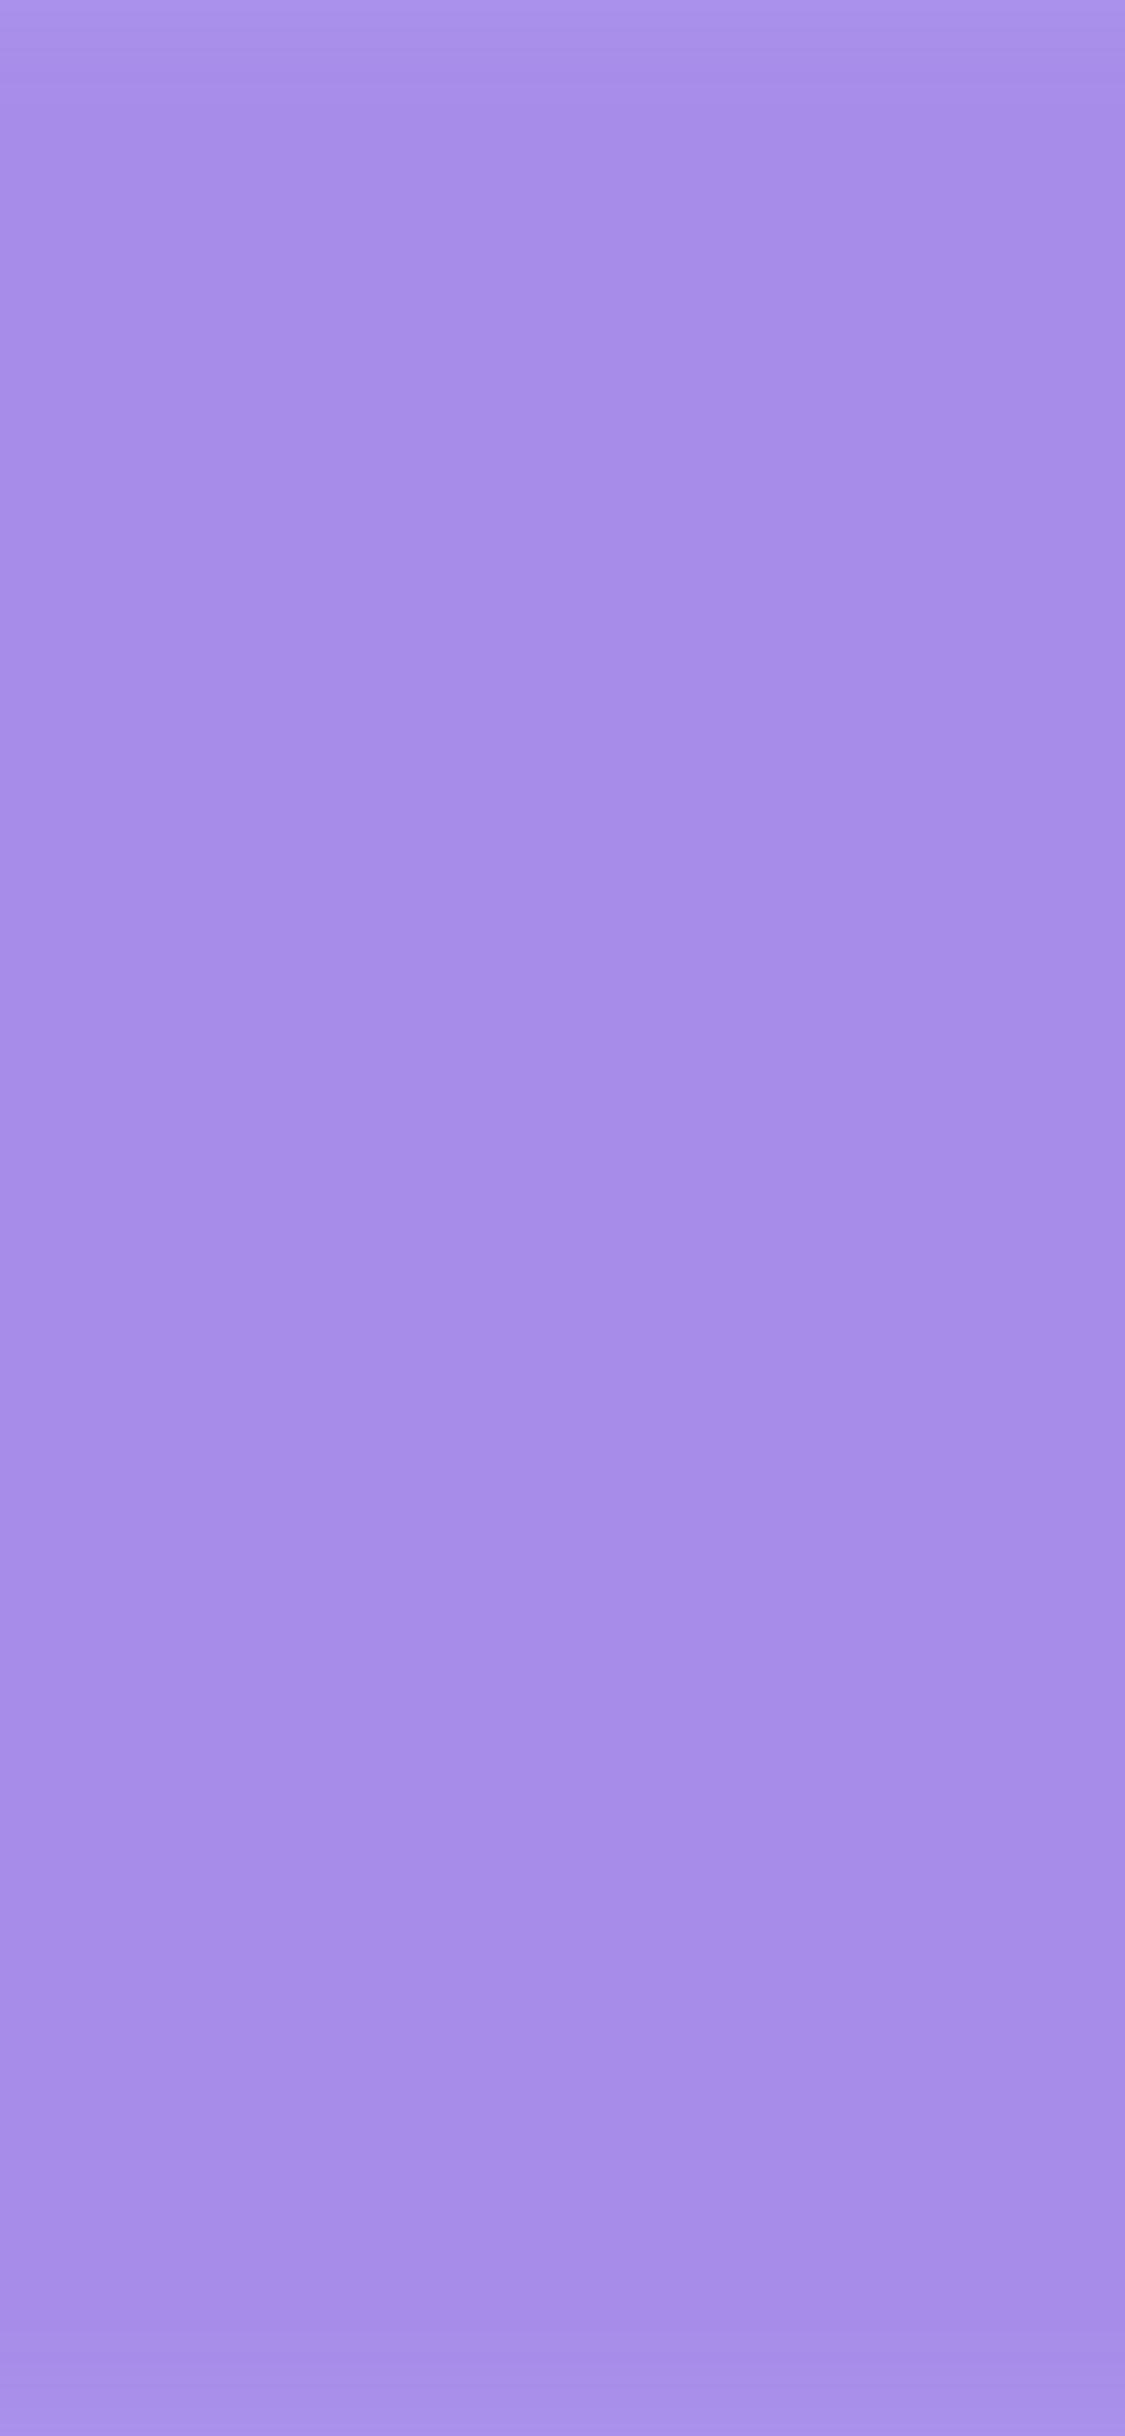 iPhoneXpapers.com-Apple-iPhone-wallpaper-sk48-flat-purple-blur-gradation